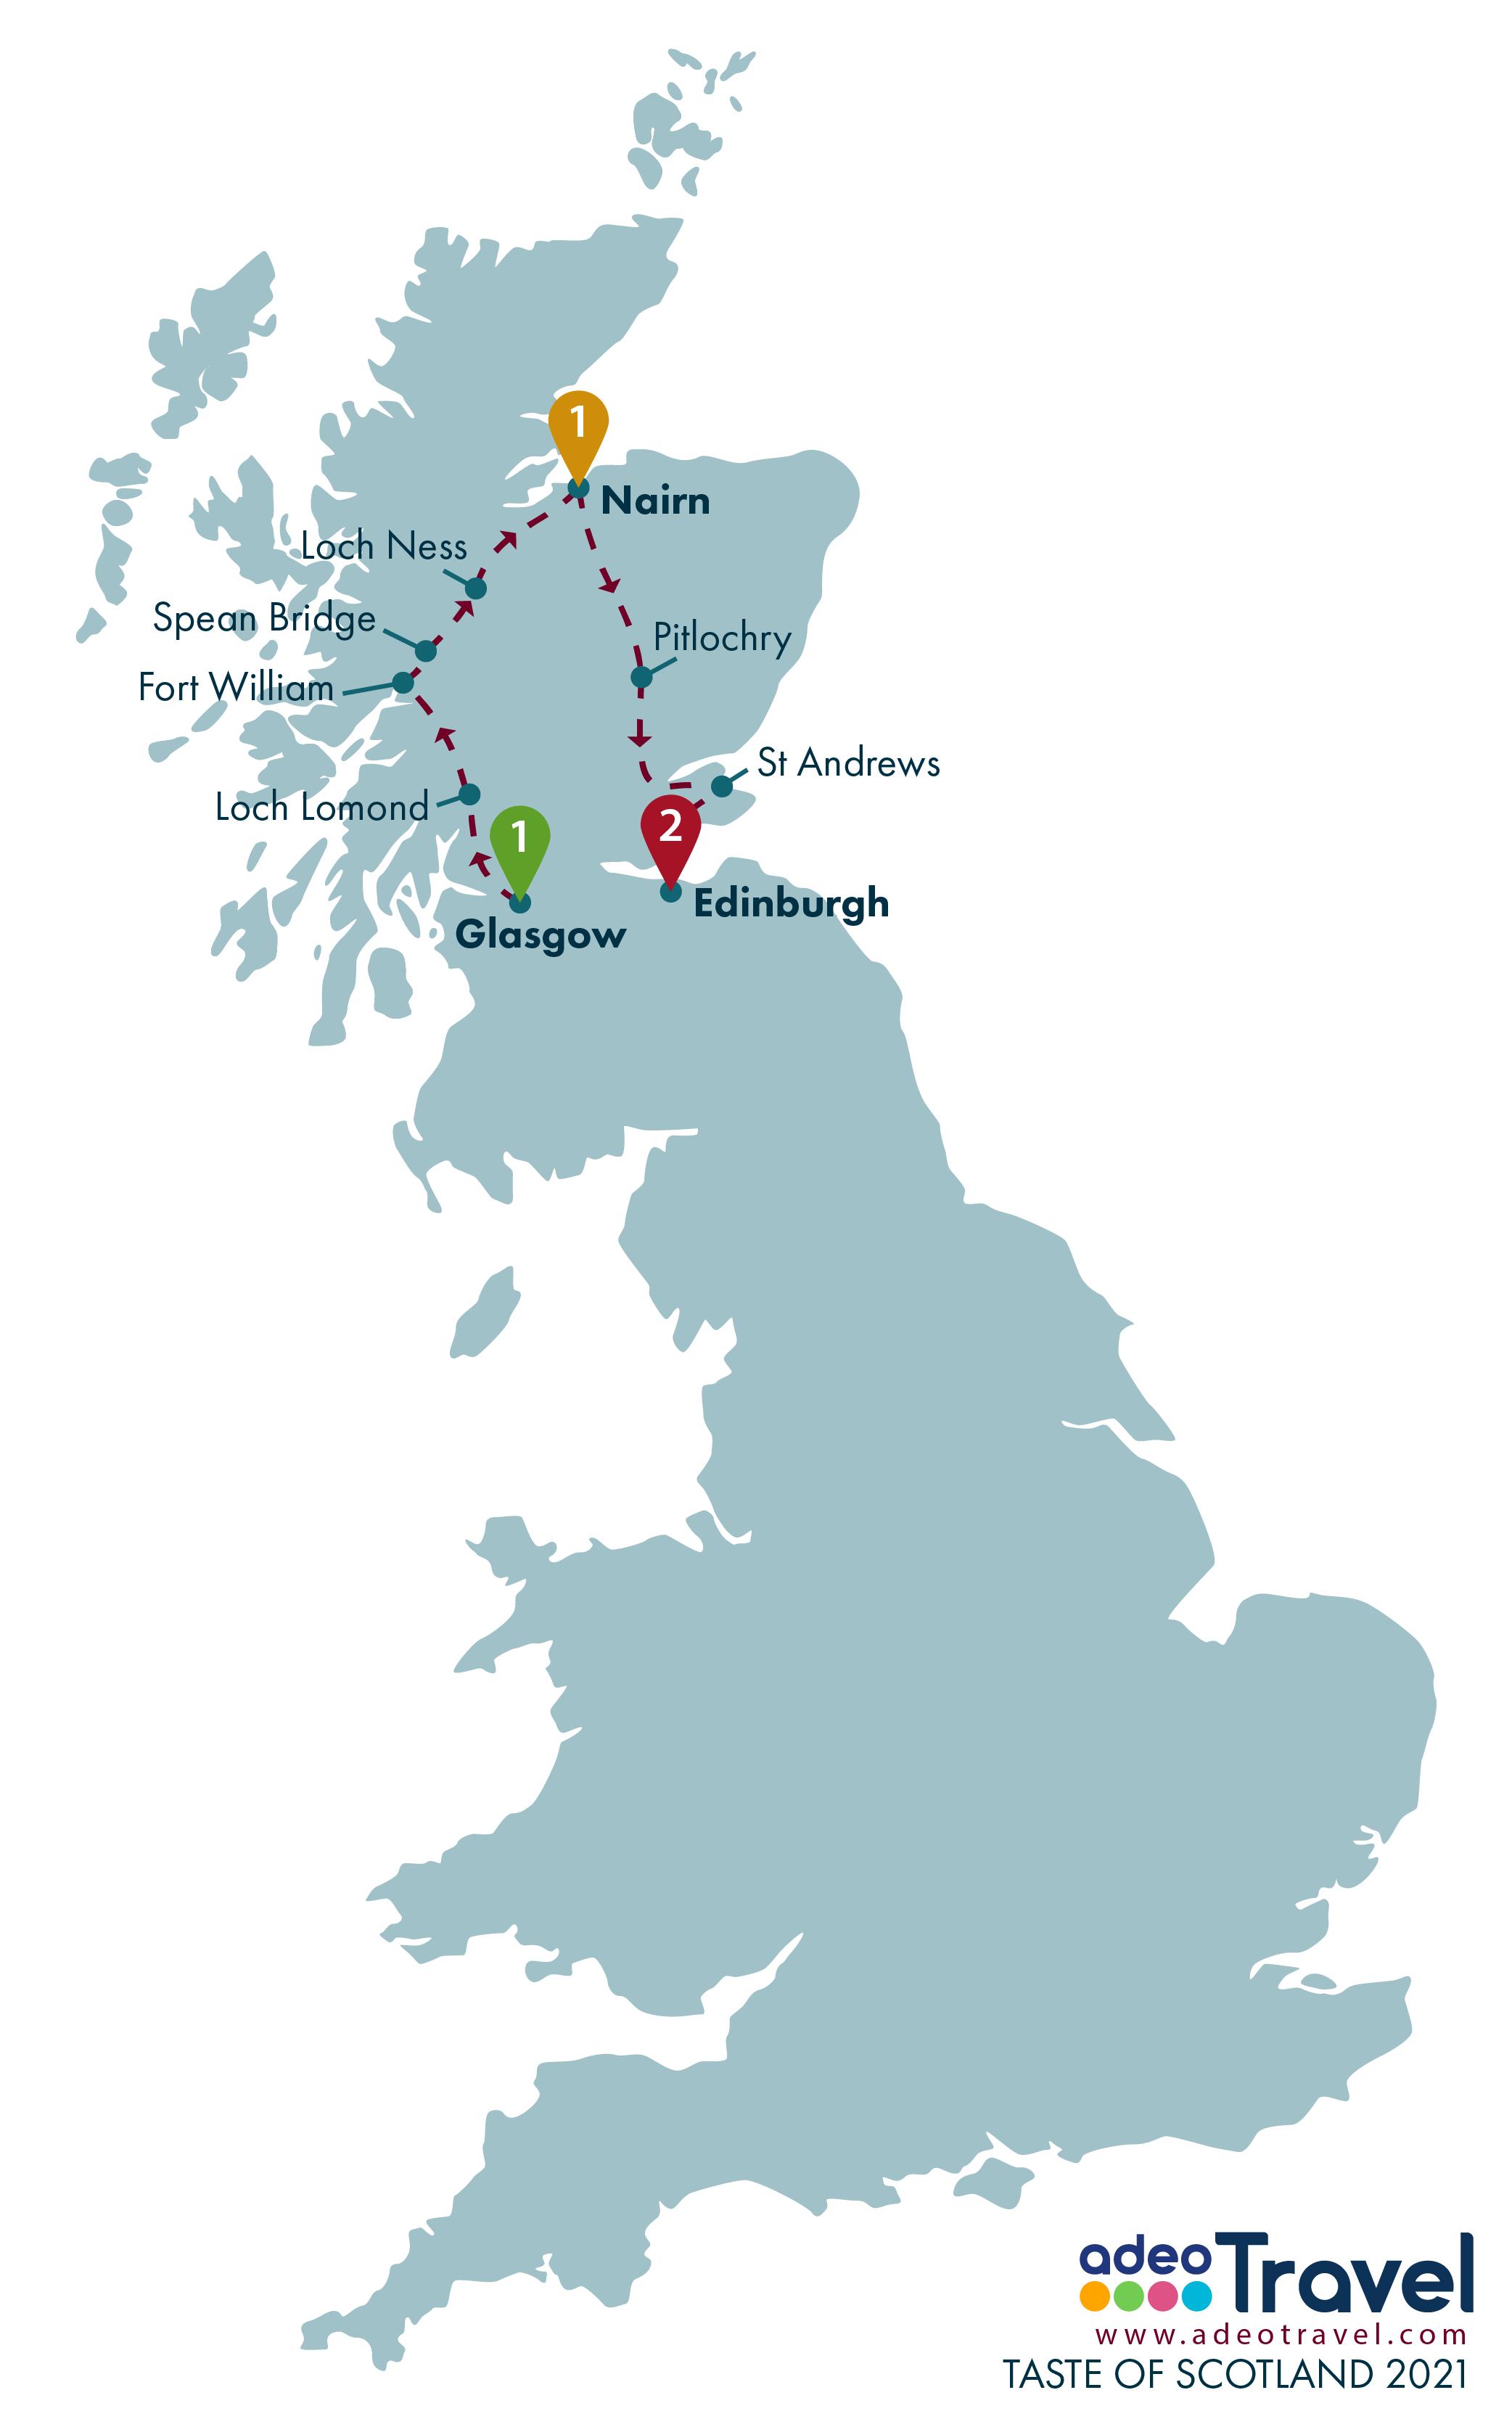 Map - Taste of Scotland 2021